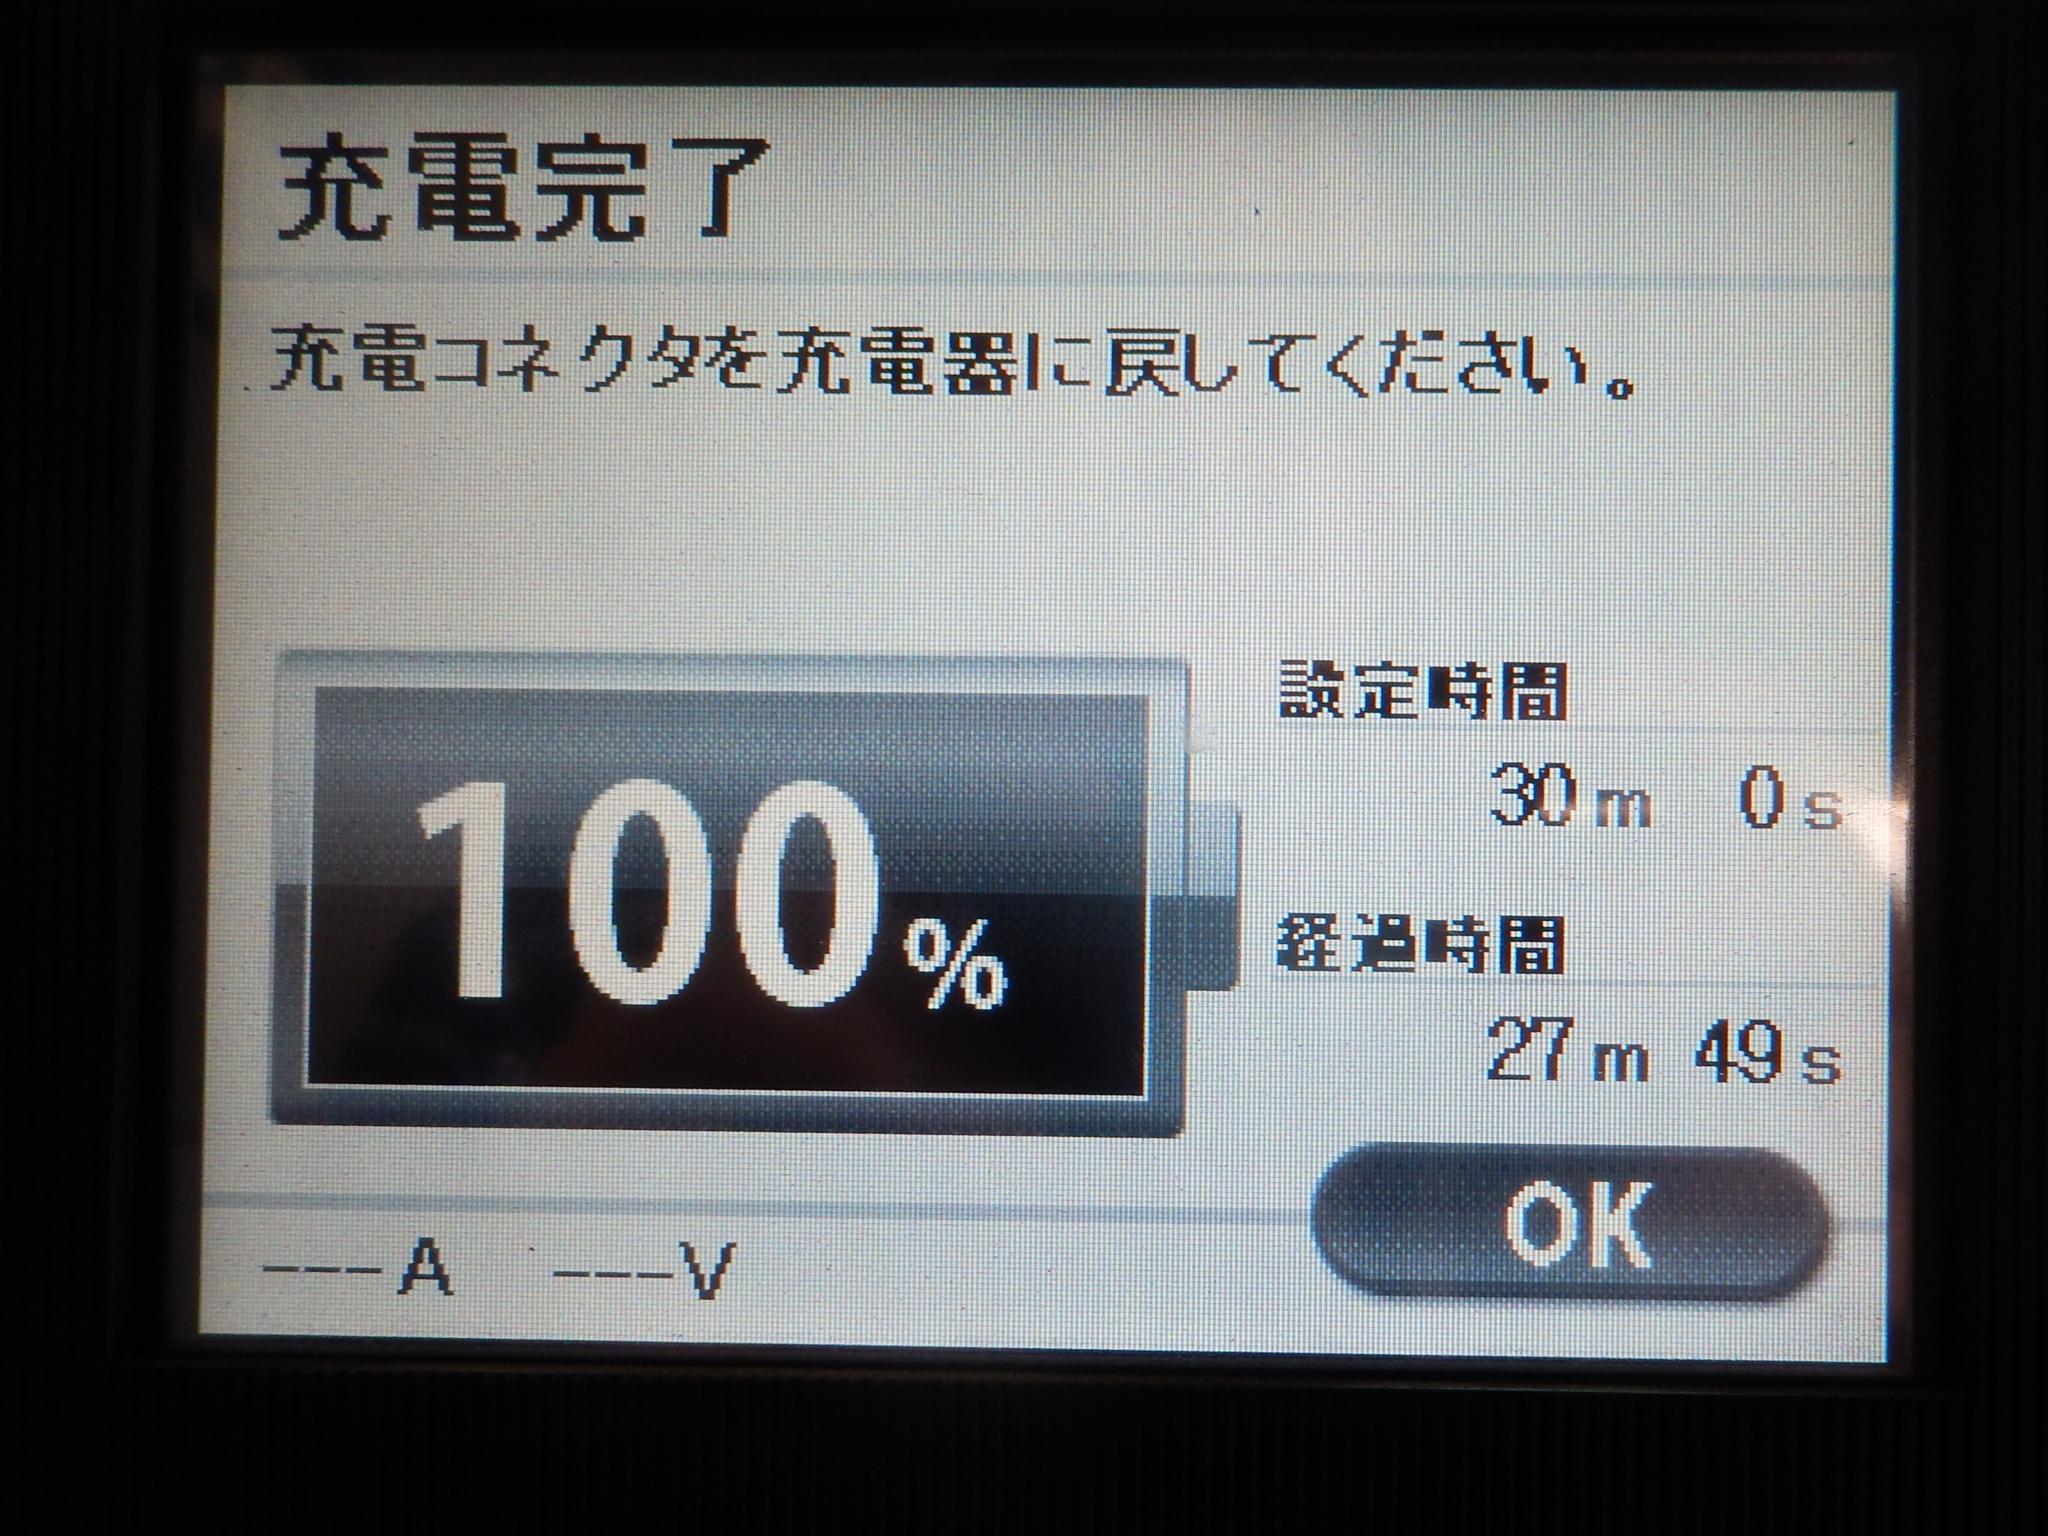 f:id:ToshUeno:20150513070729j:plain